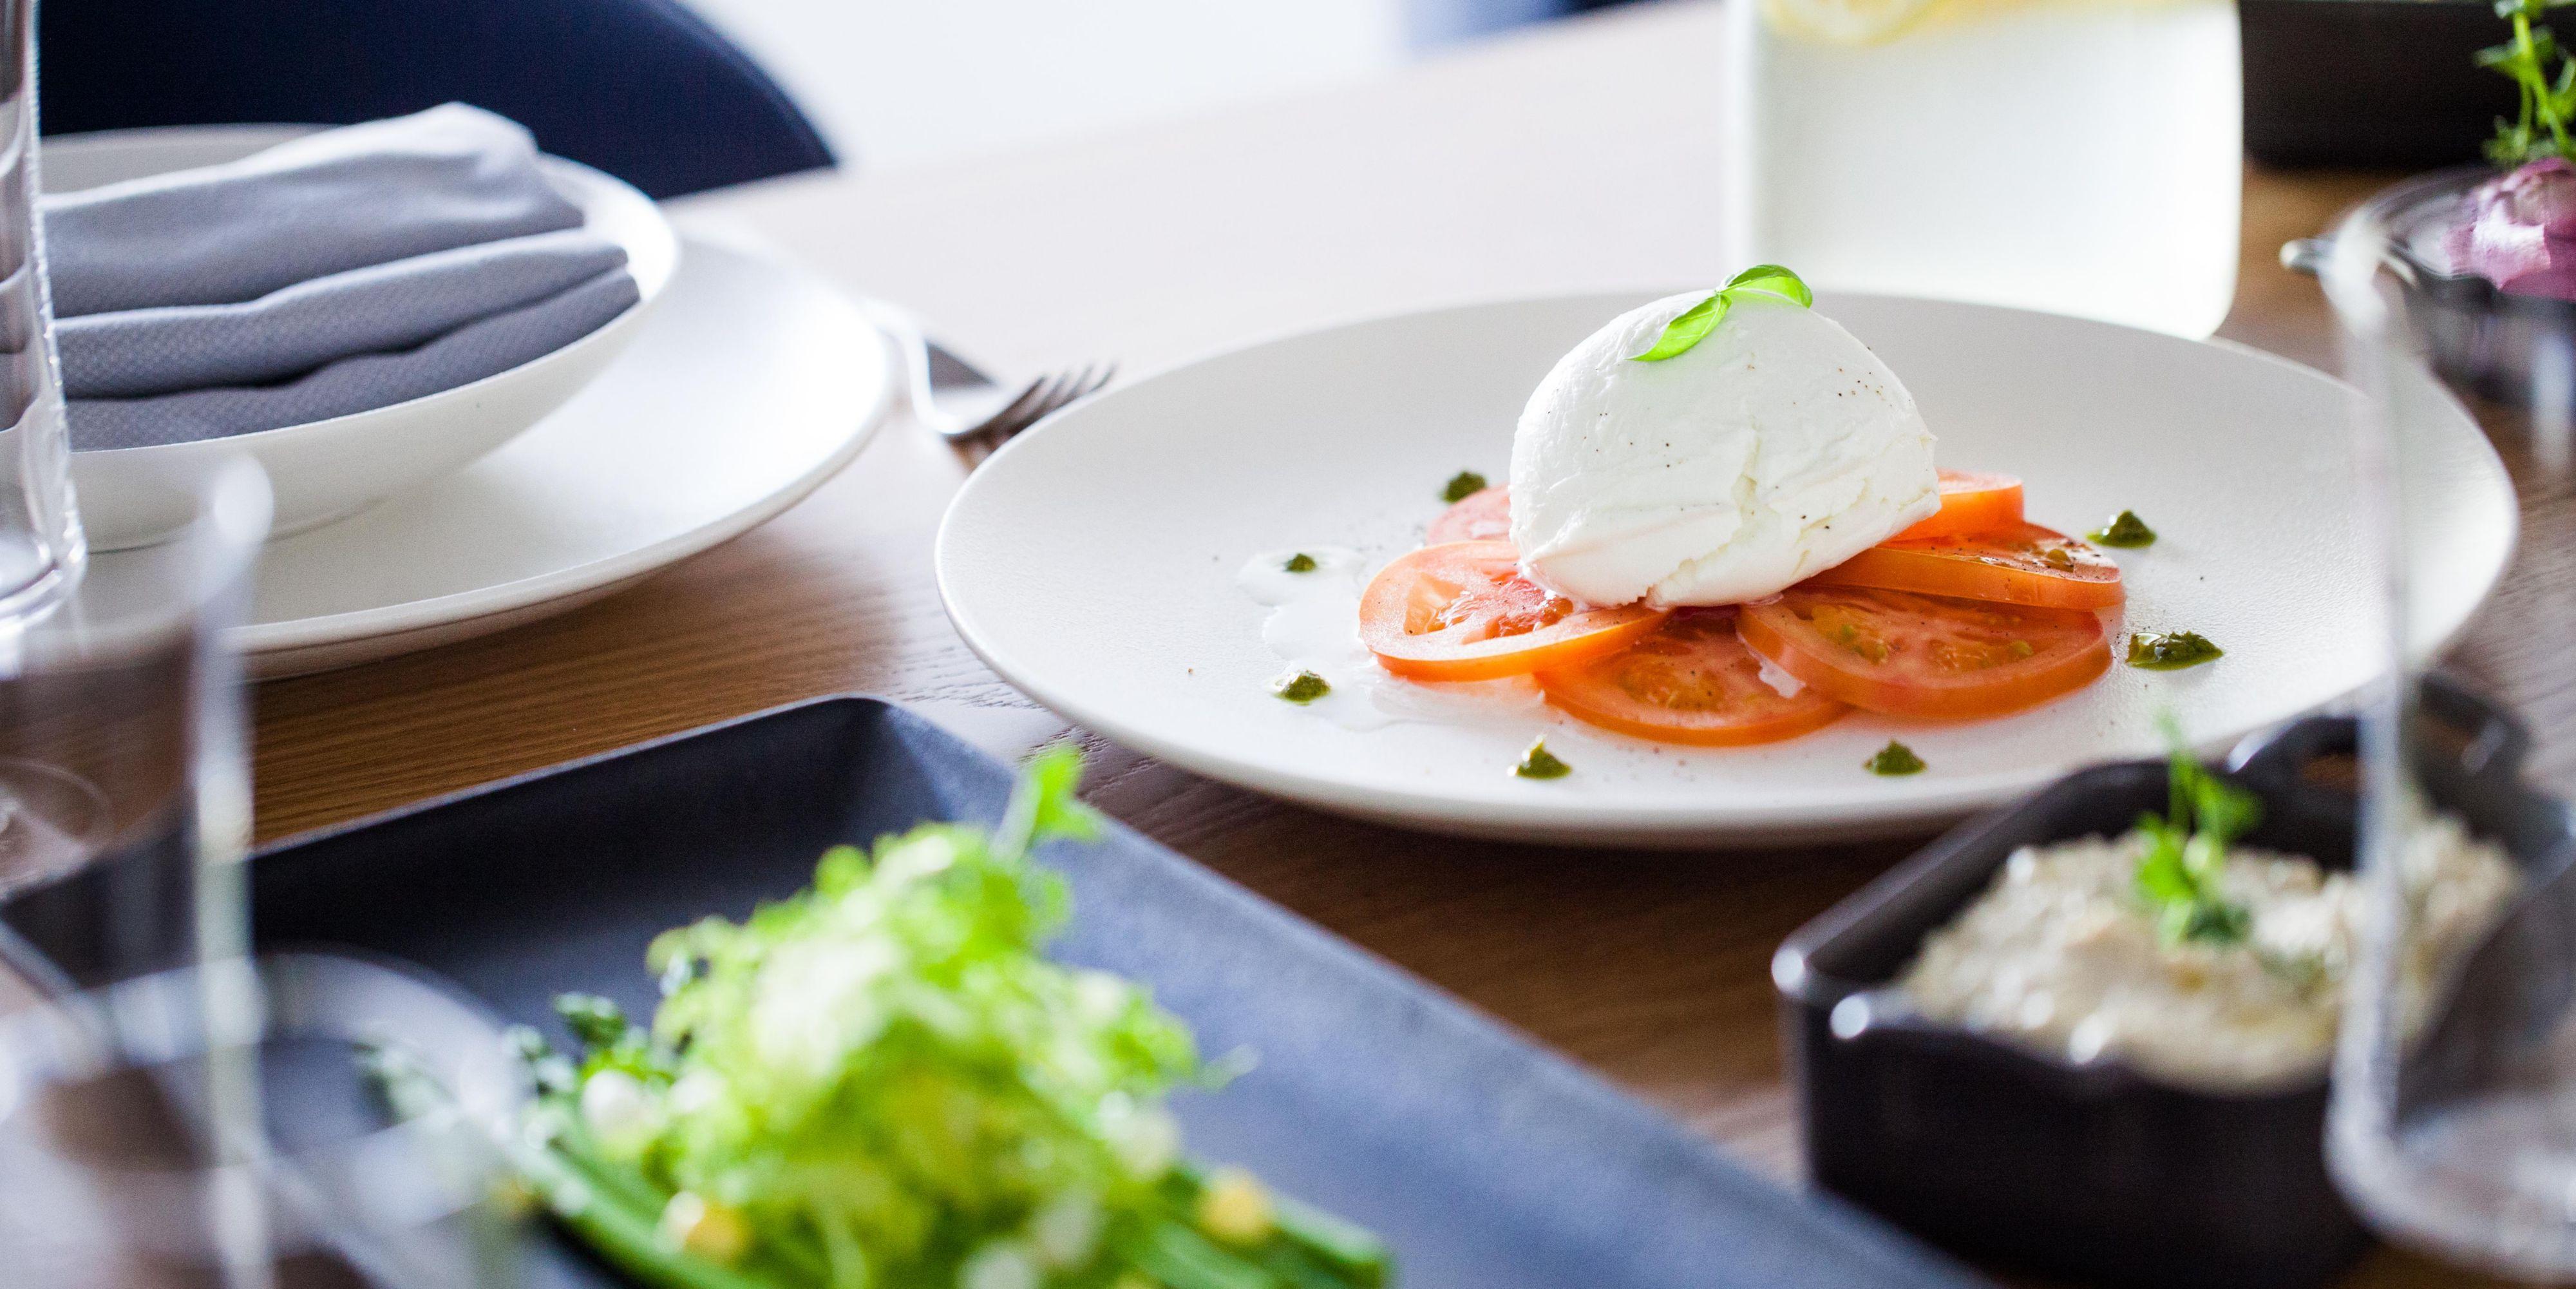 Celsius Restaurant, voco Dubai, Sheikh Zayed Road. All day dining